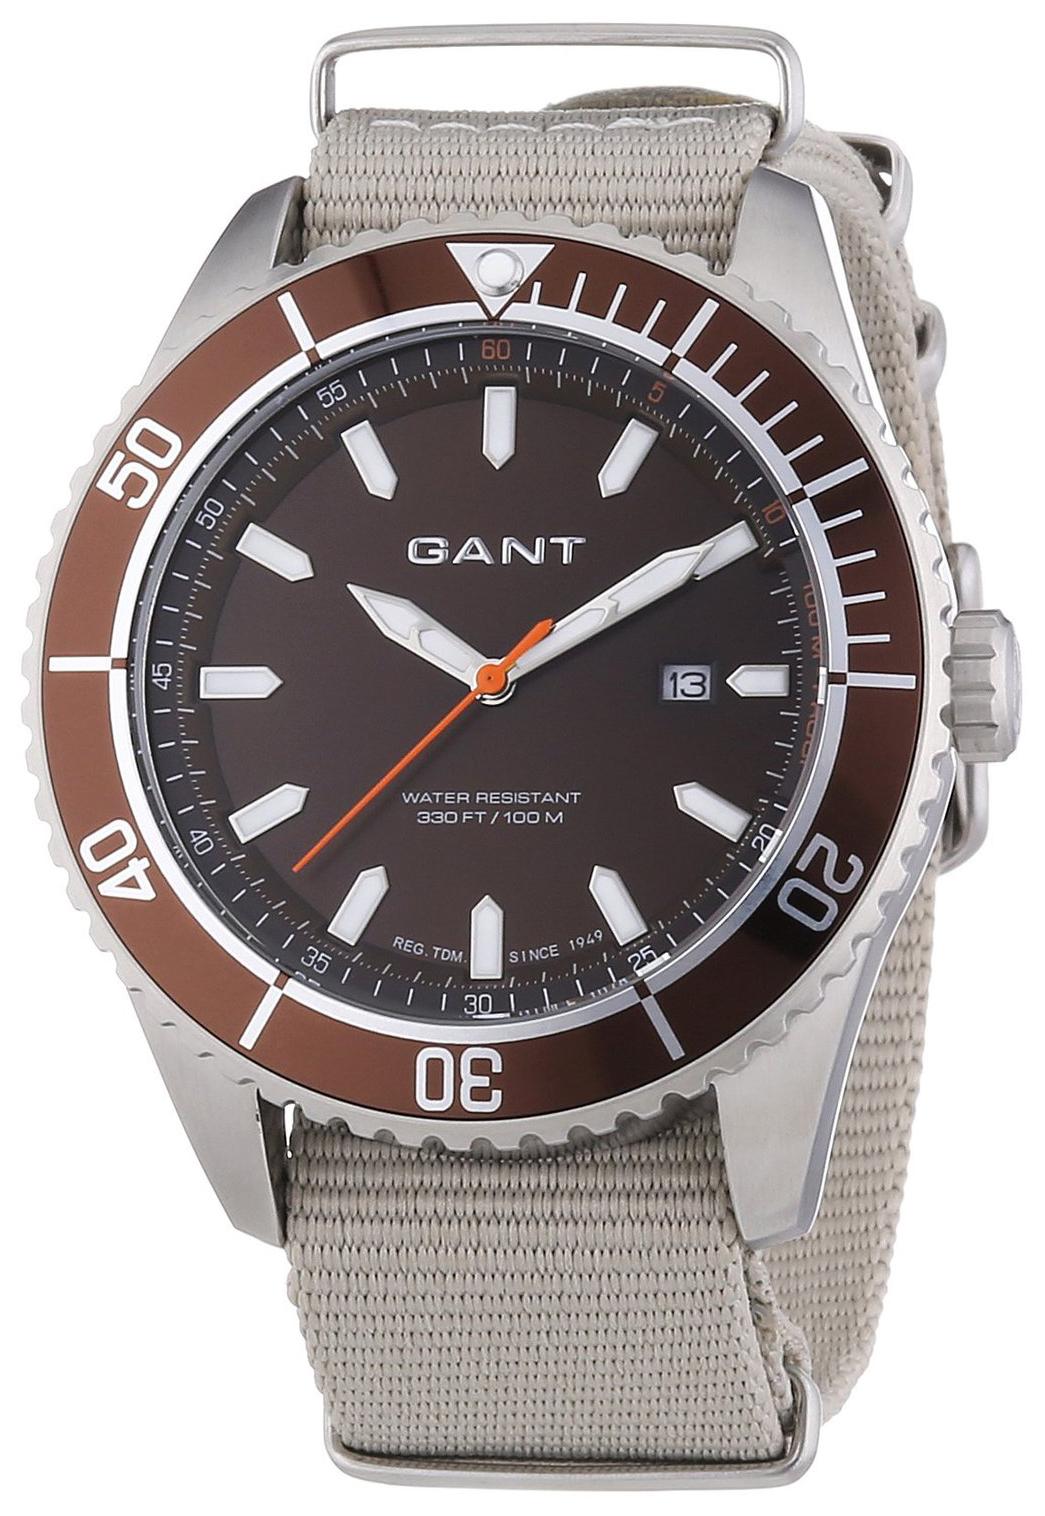 Gant Seabrook Herreklokke W70633 Brun/Tekstil Ø45 mm - Gant